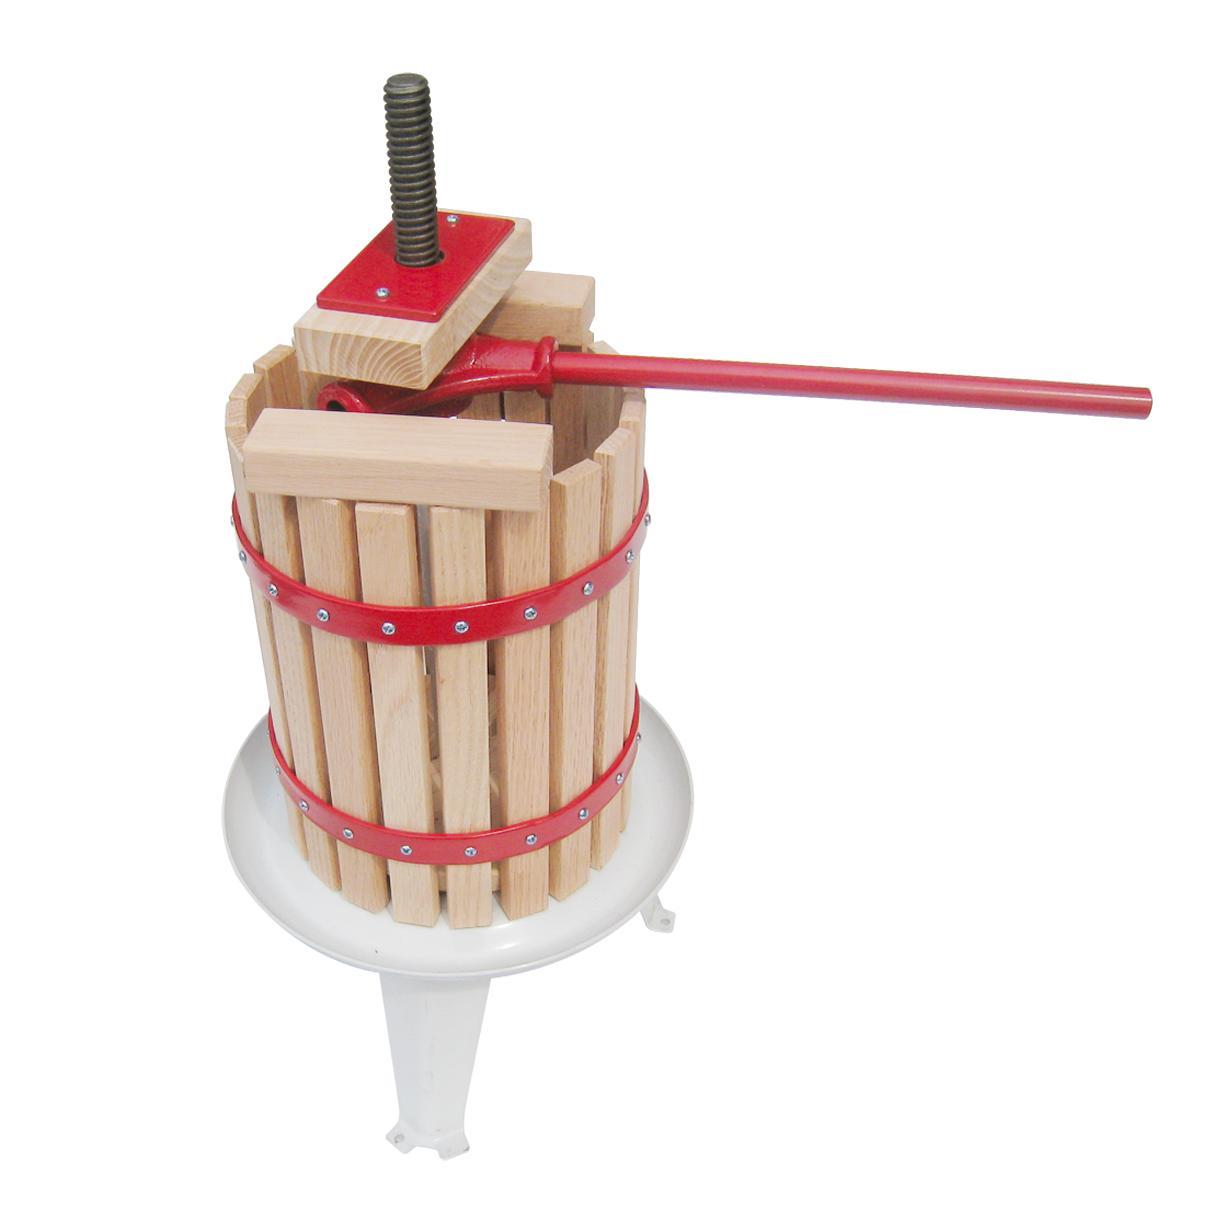 Maxtra fruit press wine press apple press grape press for Home wine press